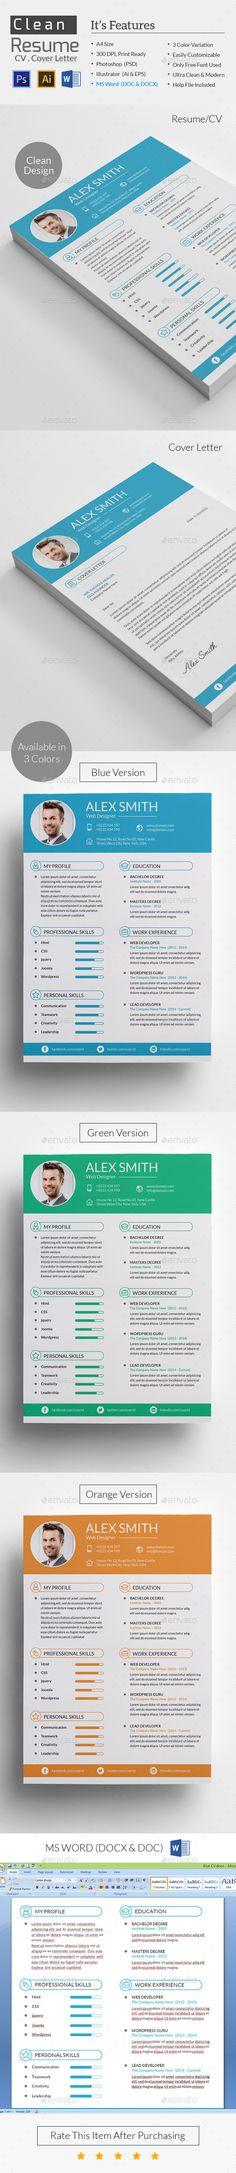 Resume Ai illustrator, Design resume and Font logo - resume paper size